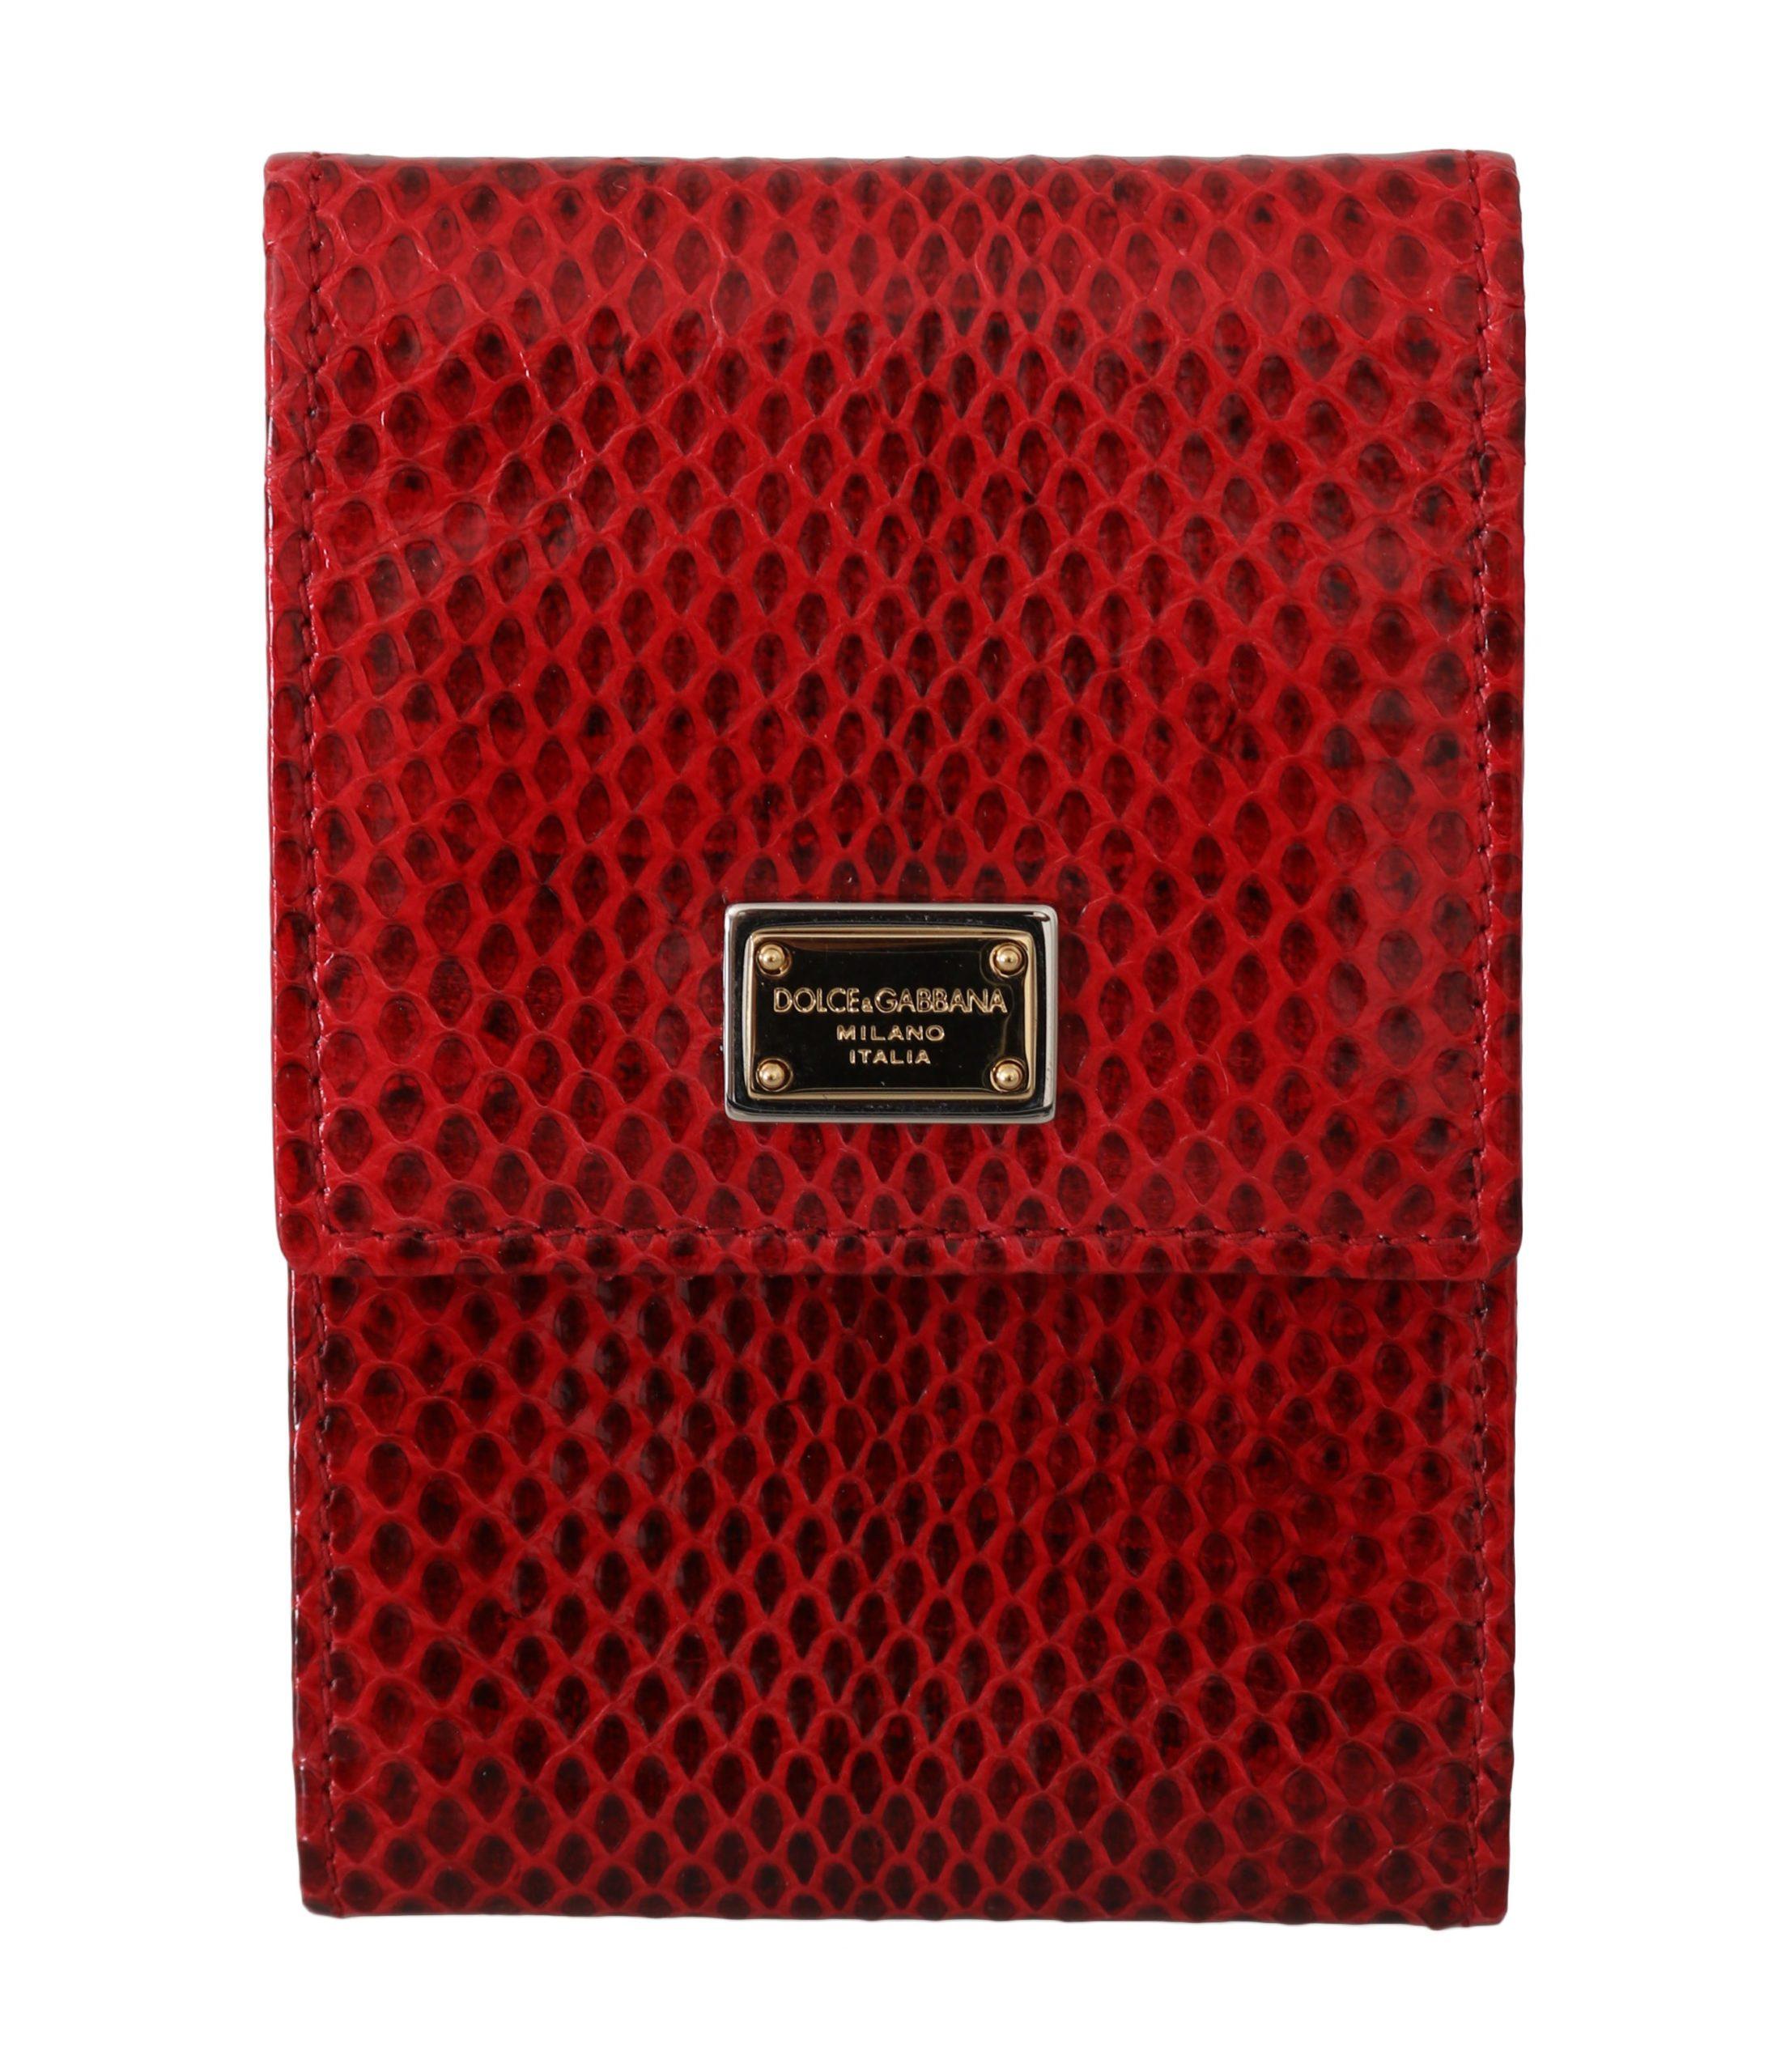 Dolce & Gabbana Women's Snakeskin Hand Purse Phone Holder Leather Wallet Red VAS8850